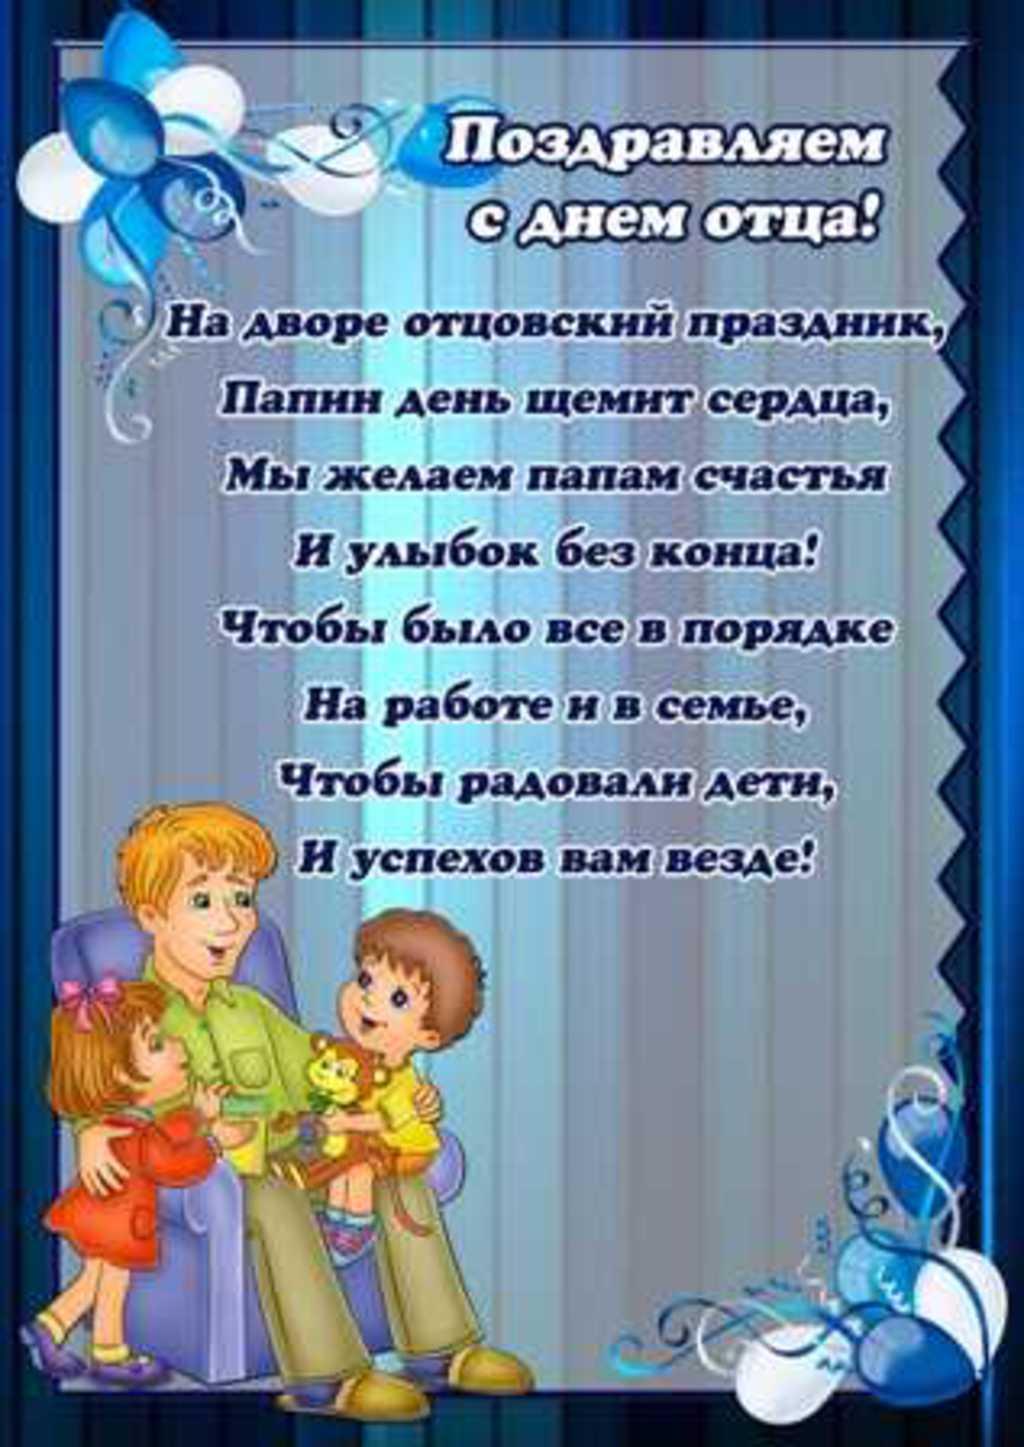 http://mdou45nsk.rusedu.net/gallery/531/den_otca_A4.jpg